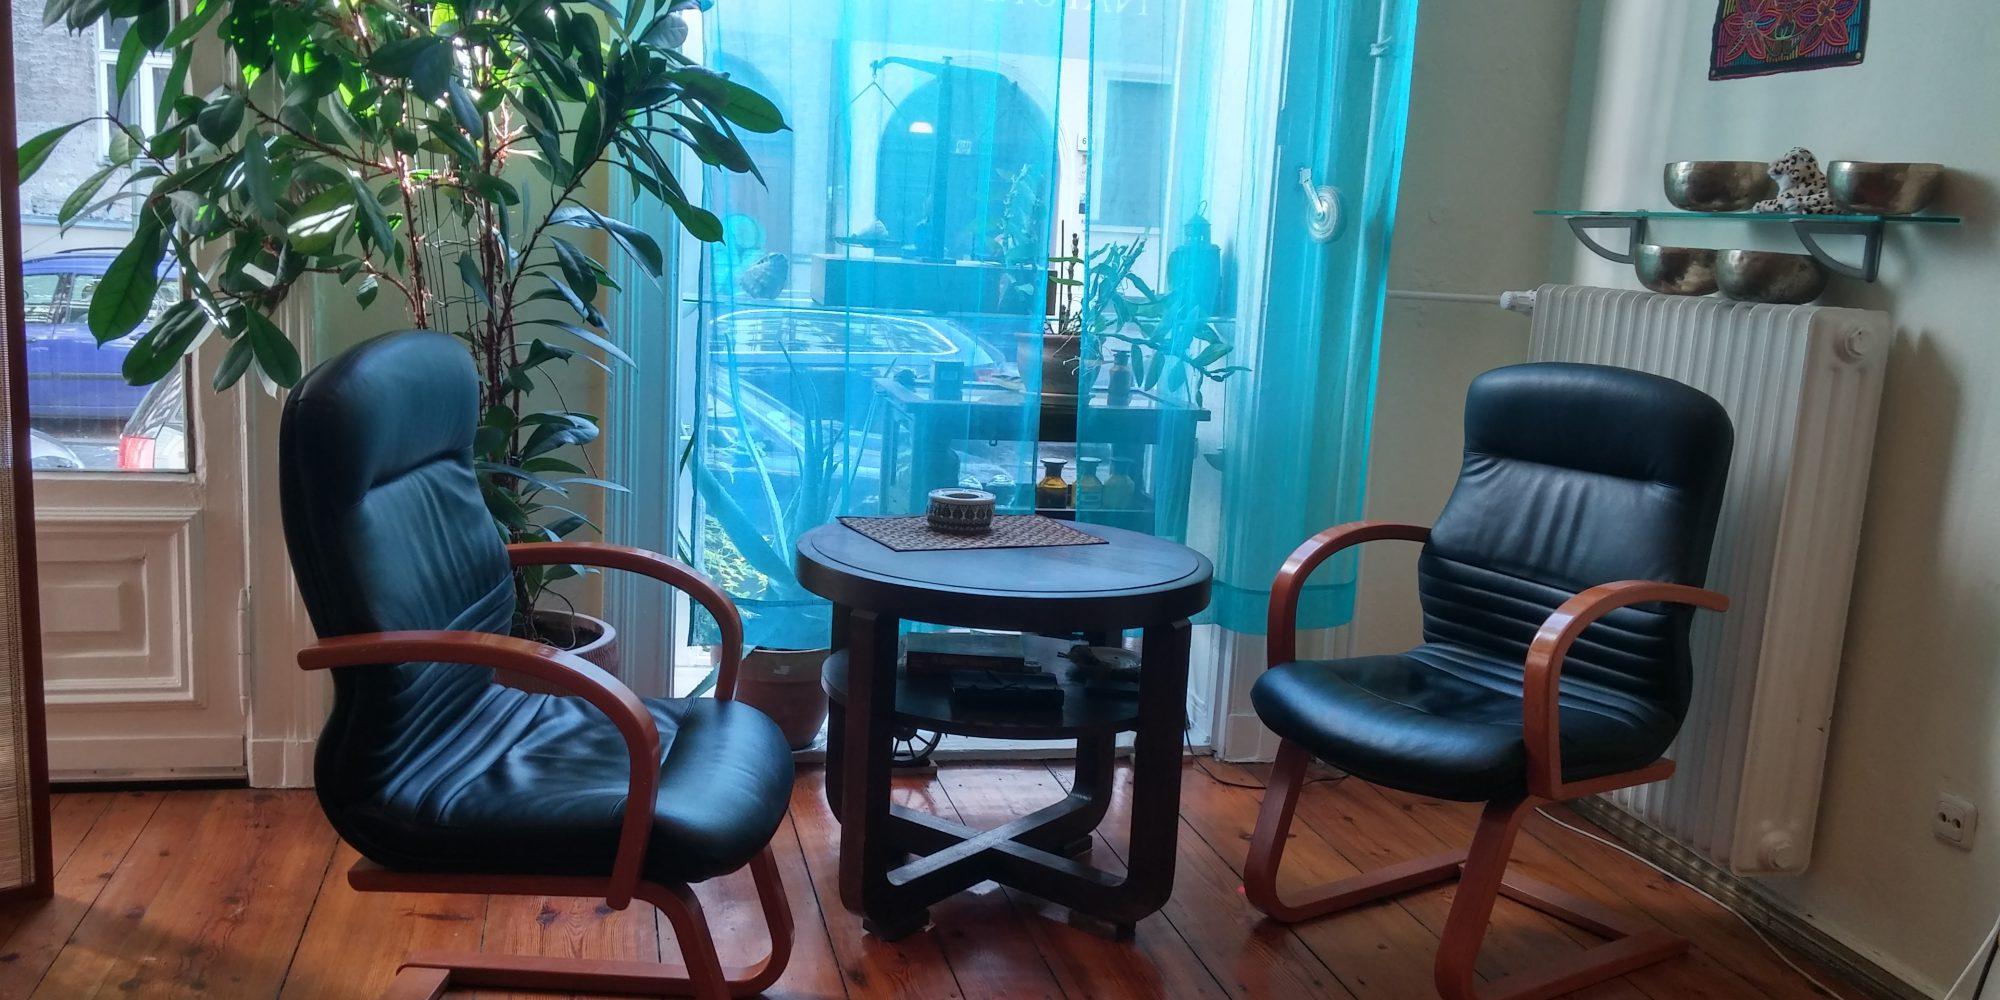 Praxis Hypnotherapie Hypnose Klangmassage Berlin